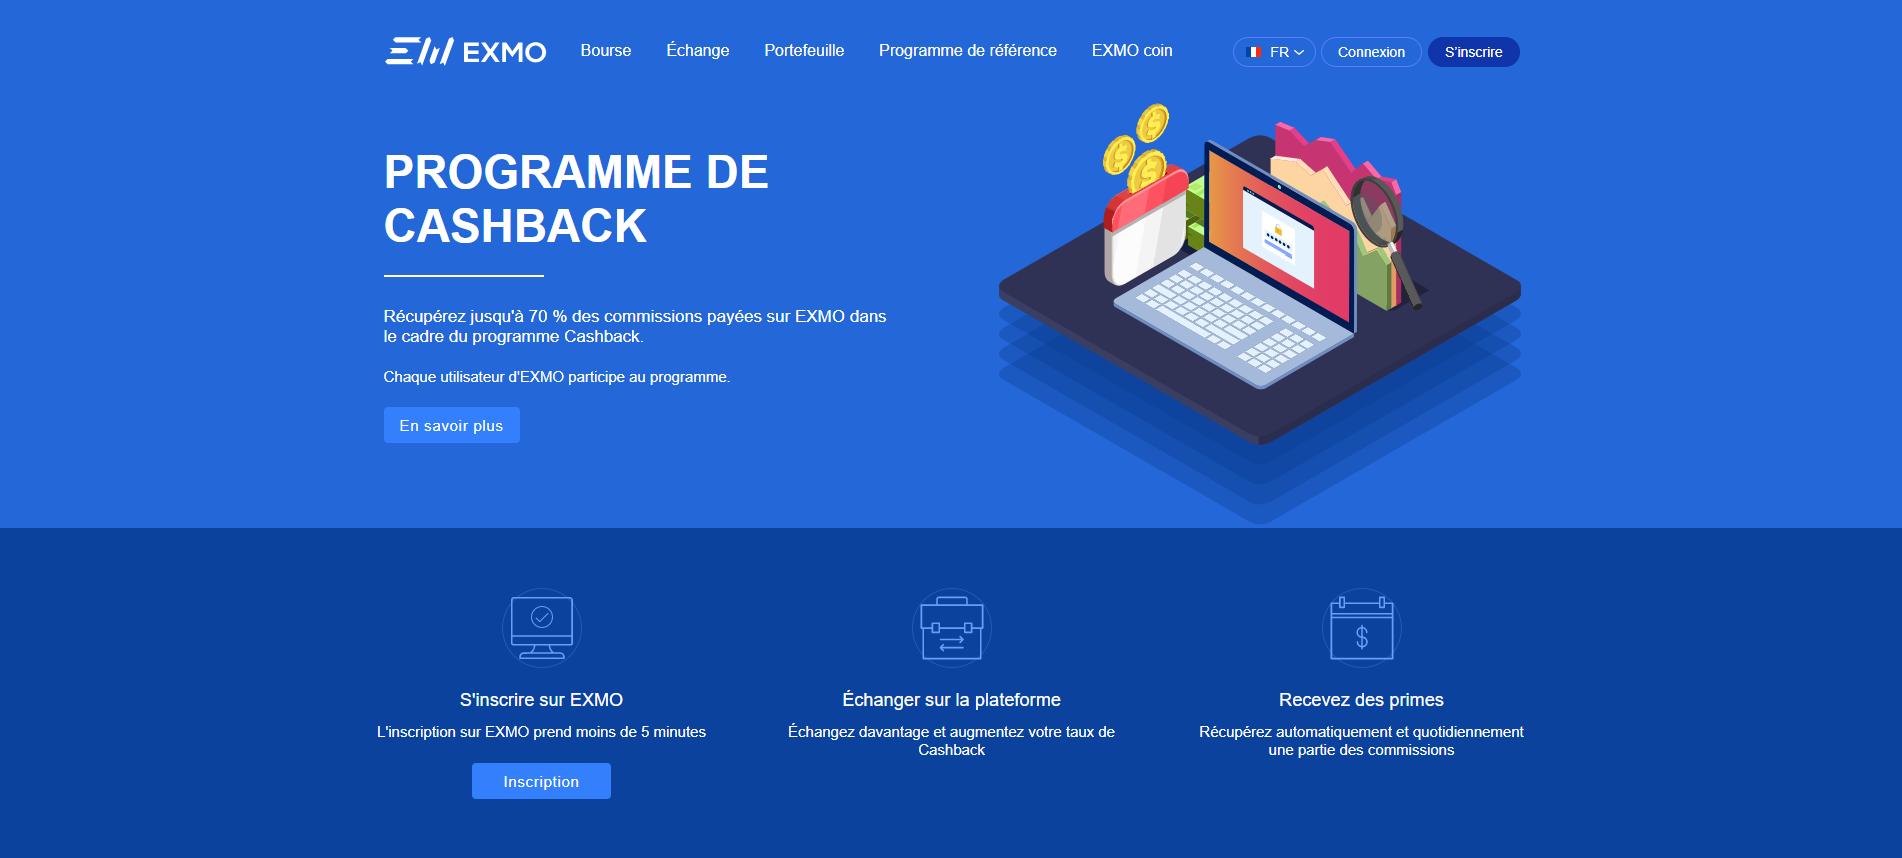 Cashback page in FR